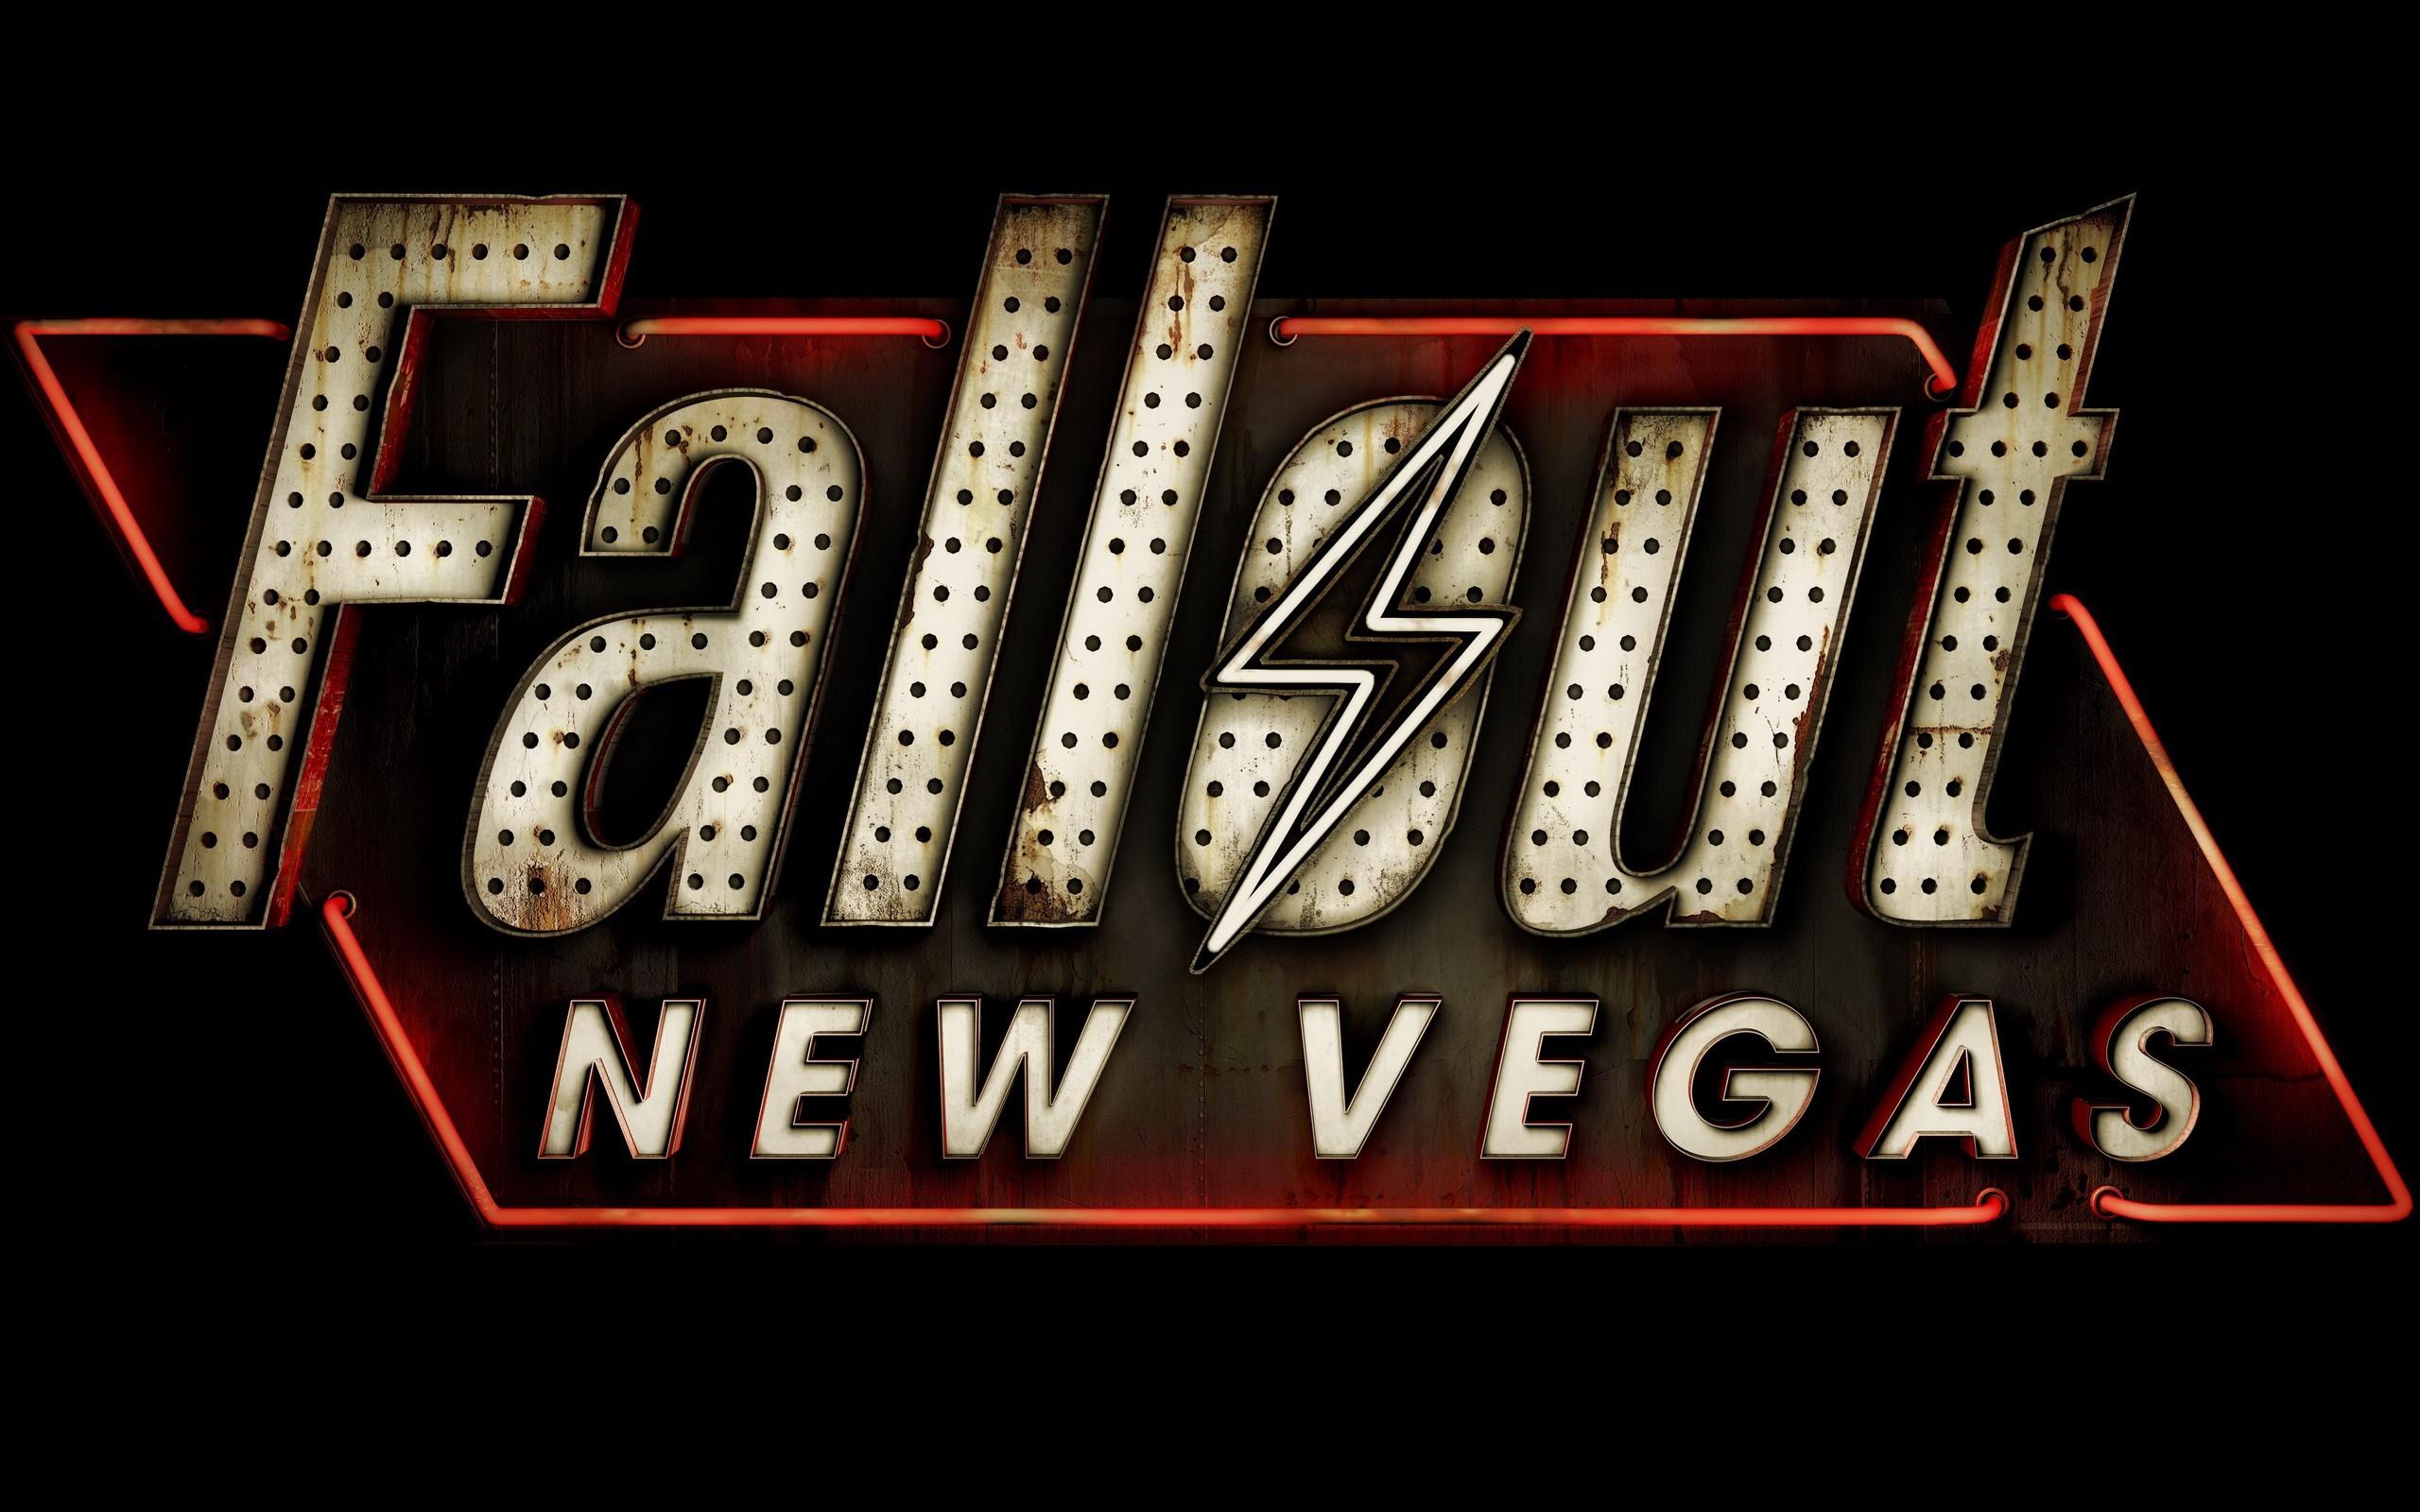 … x 1600 Original. Description: Download Fallout New Vegas RPG Games  wallpaper …